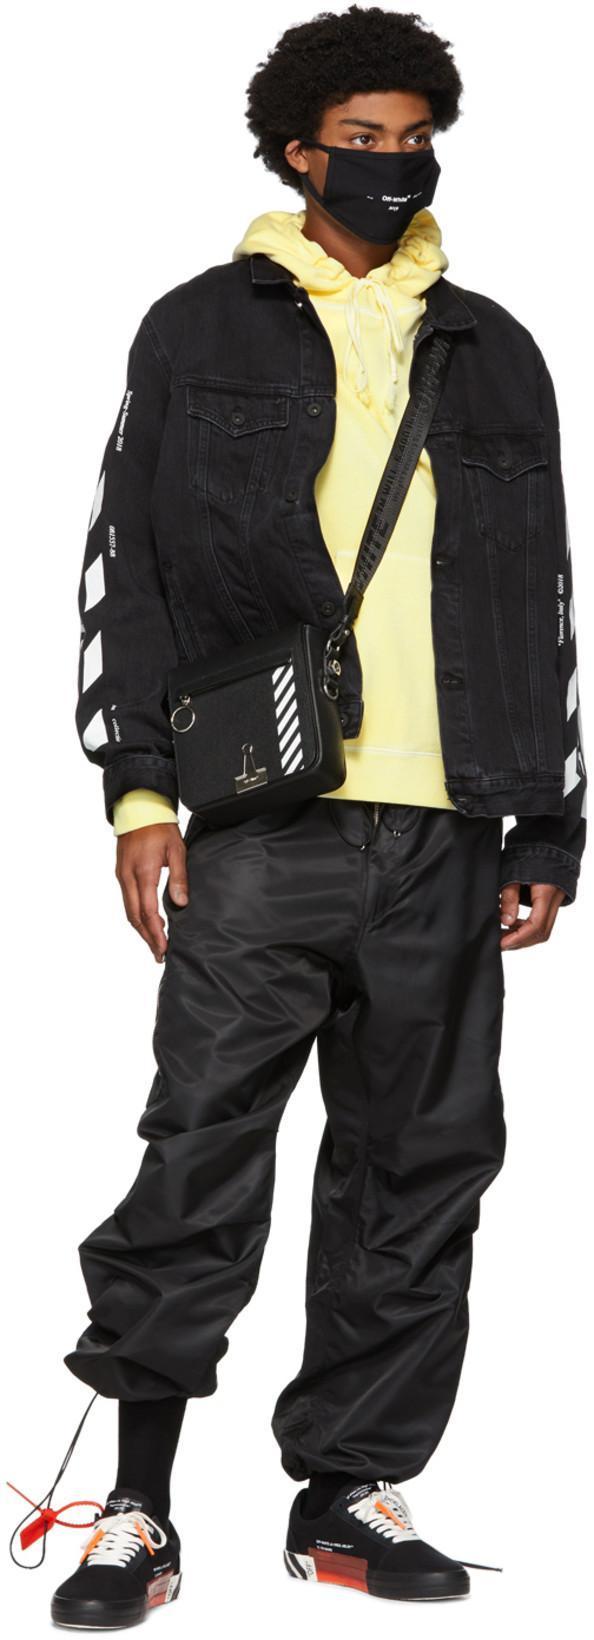 d1d148dd Off-White Black Diag Binder Clip Bag In Black/White | ModeSens